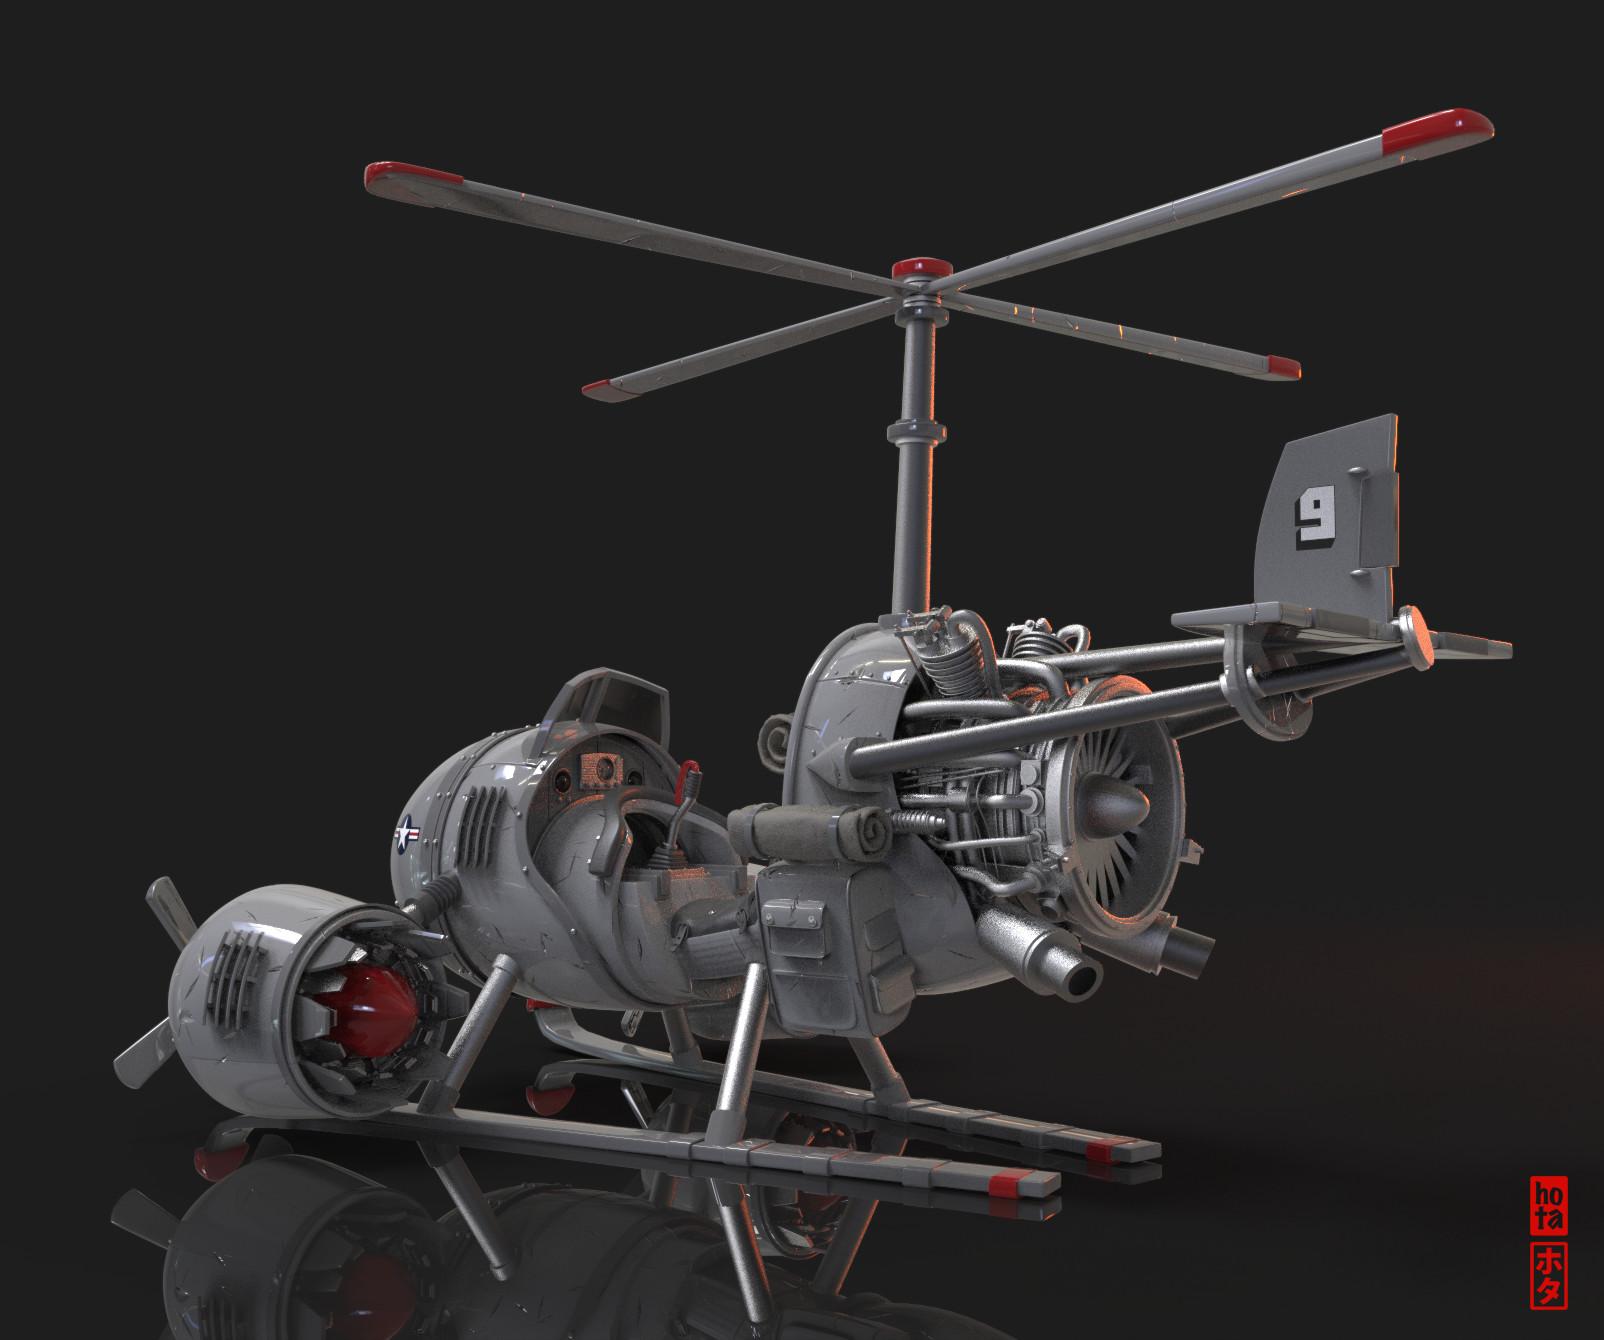 Hota aisa chorrocoptero final 4240